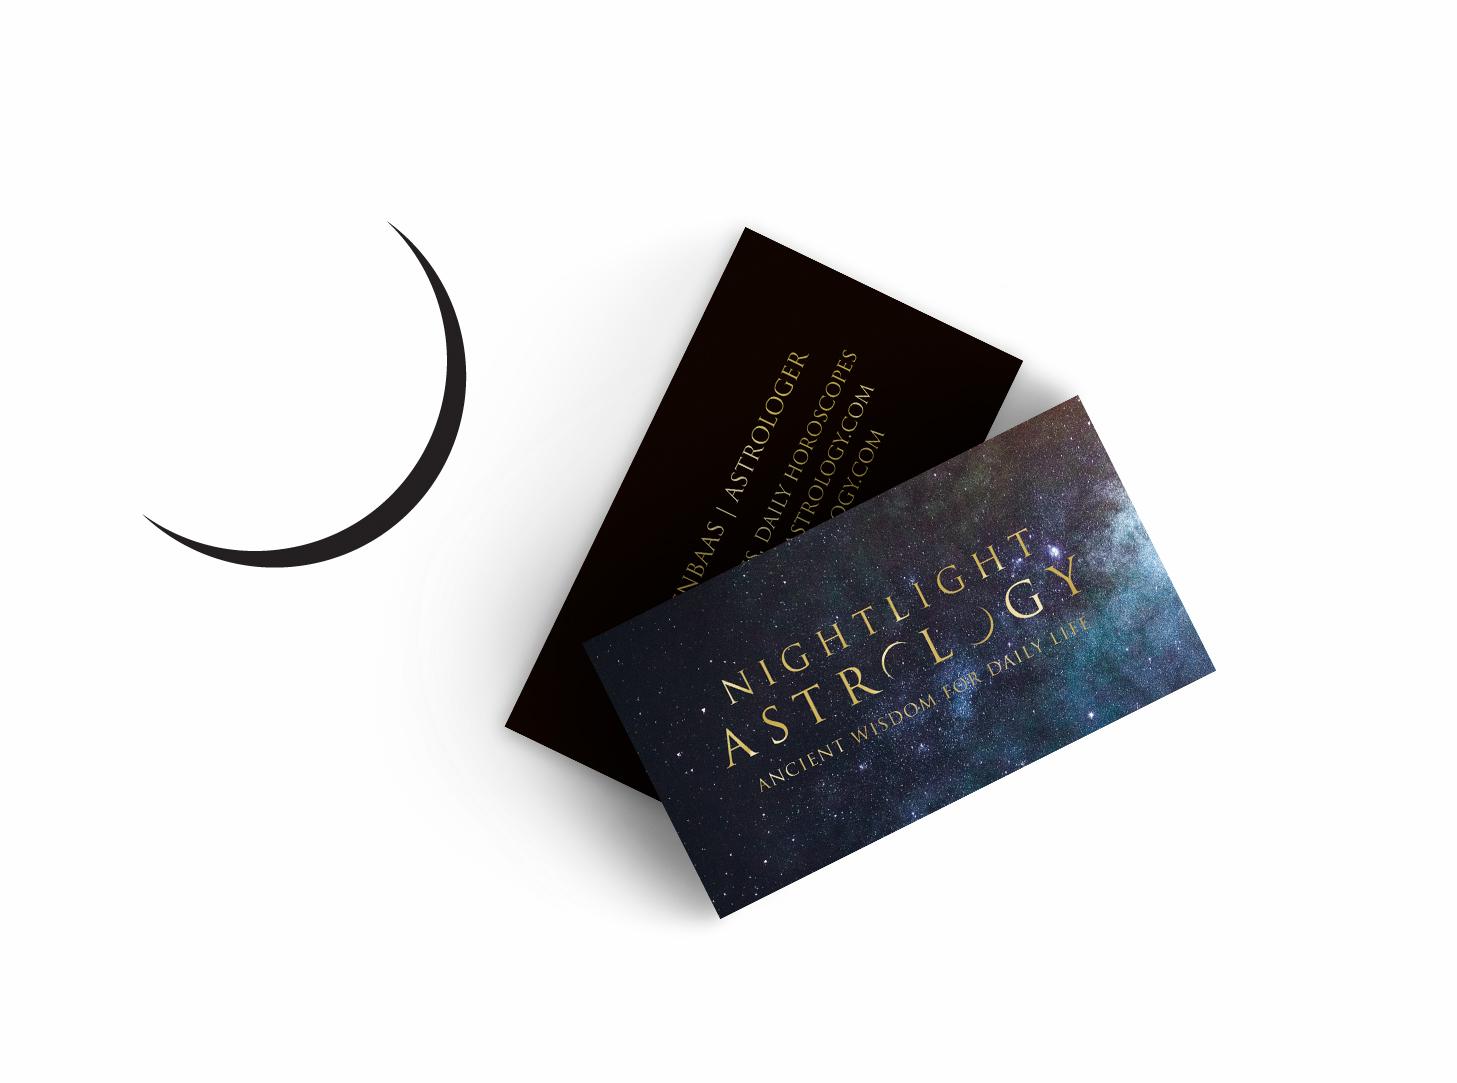 Nightlight Astrology business cards